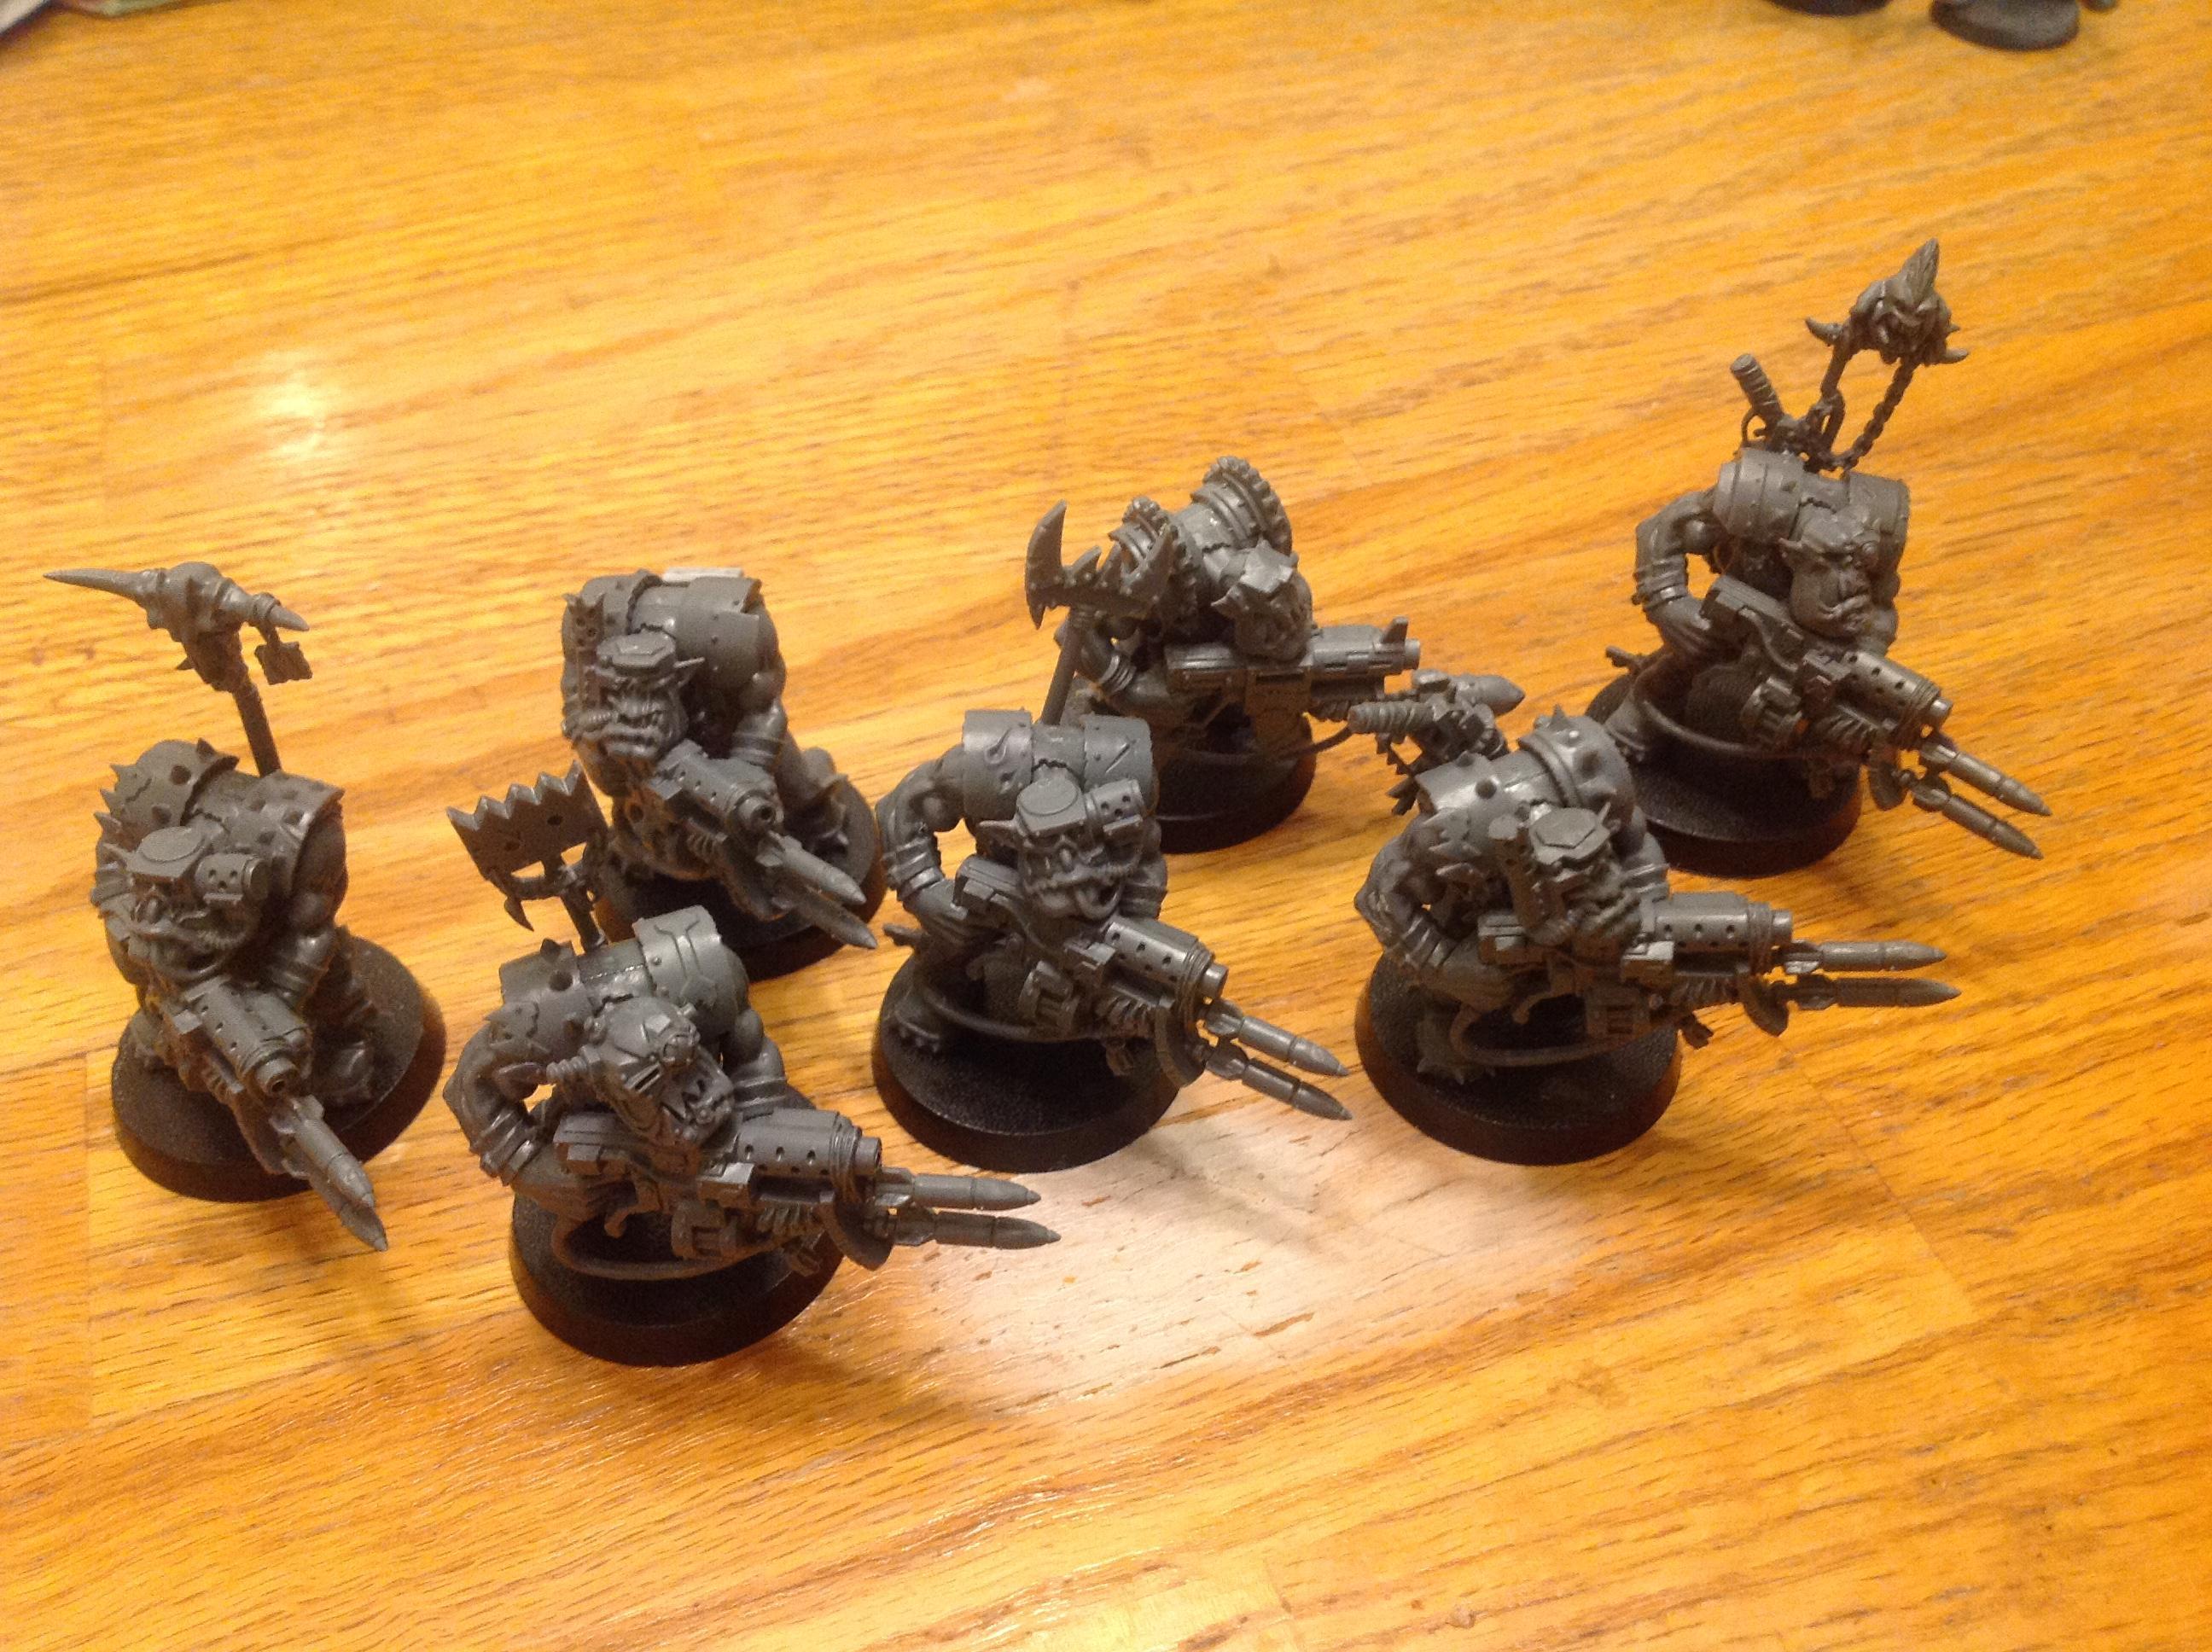 Boy, Nob, Orks, Themes, Trukk, Waaazag, Warhammer 40,000